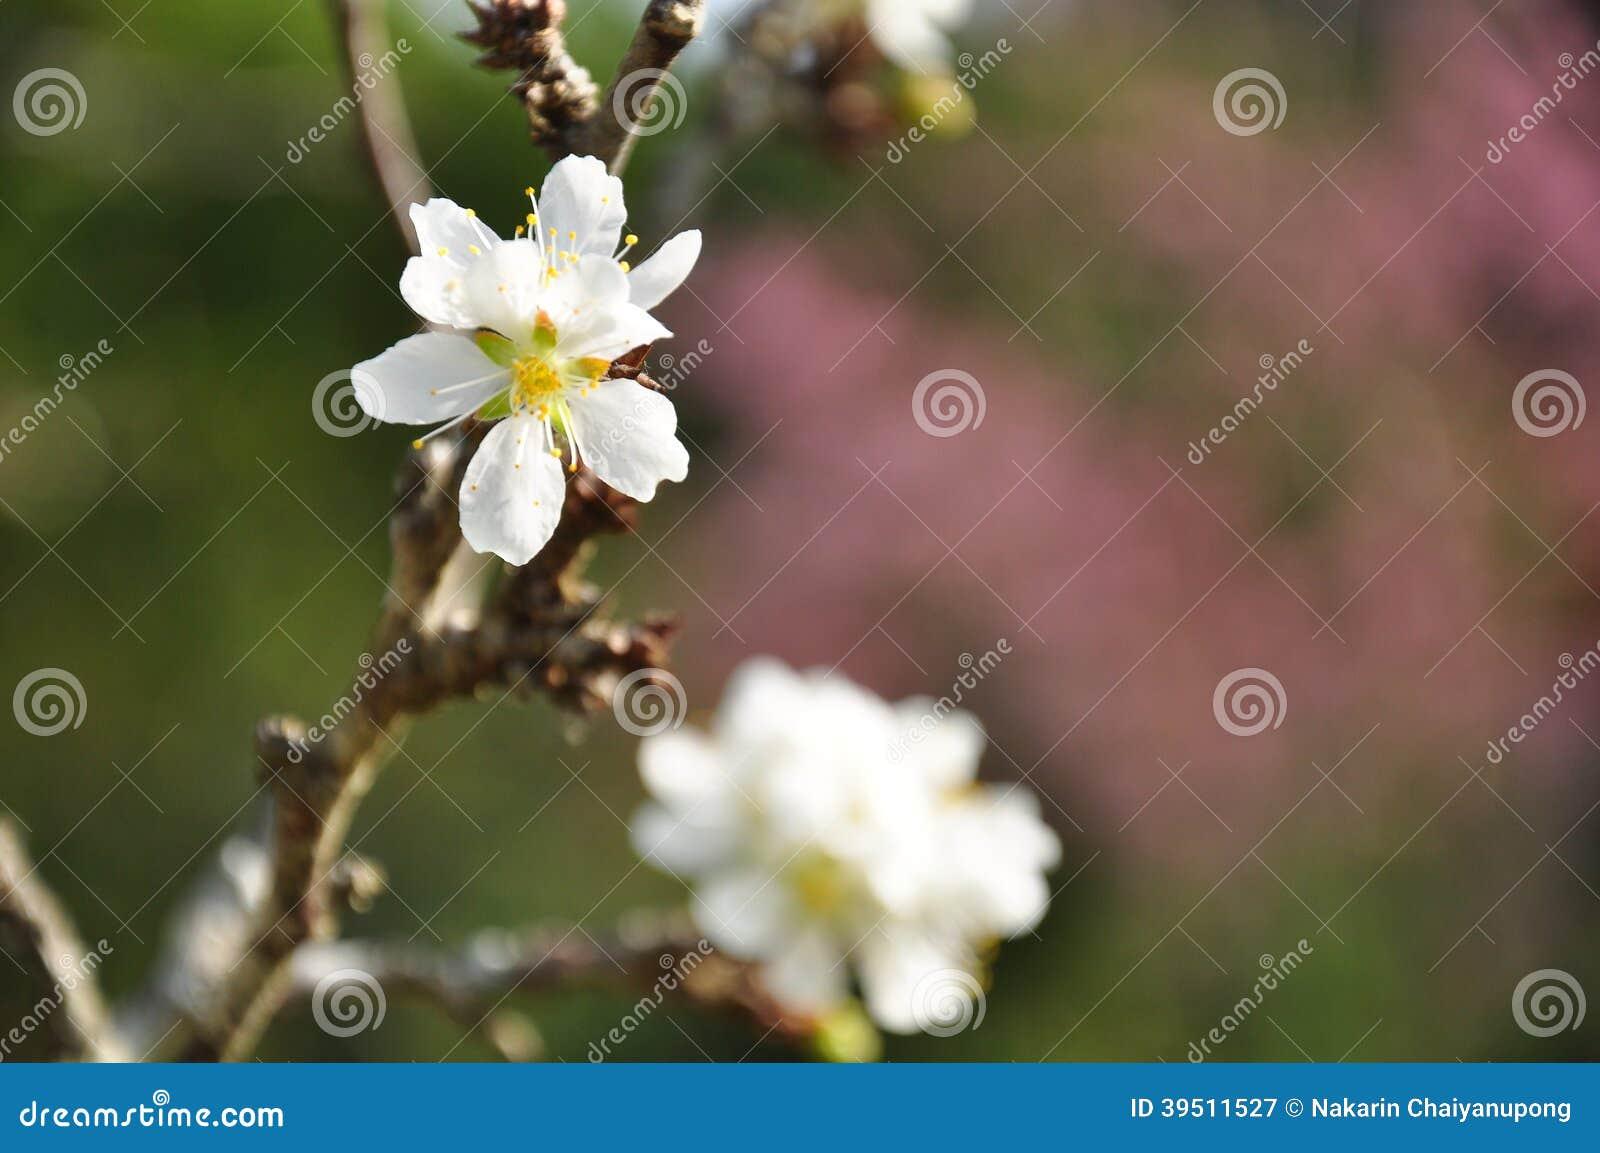 Closeup of peach flowers